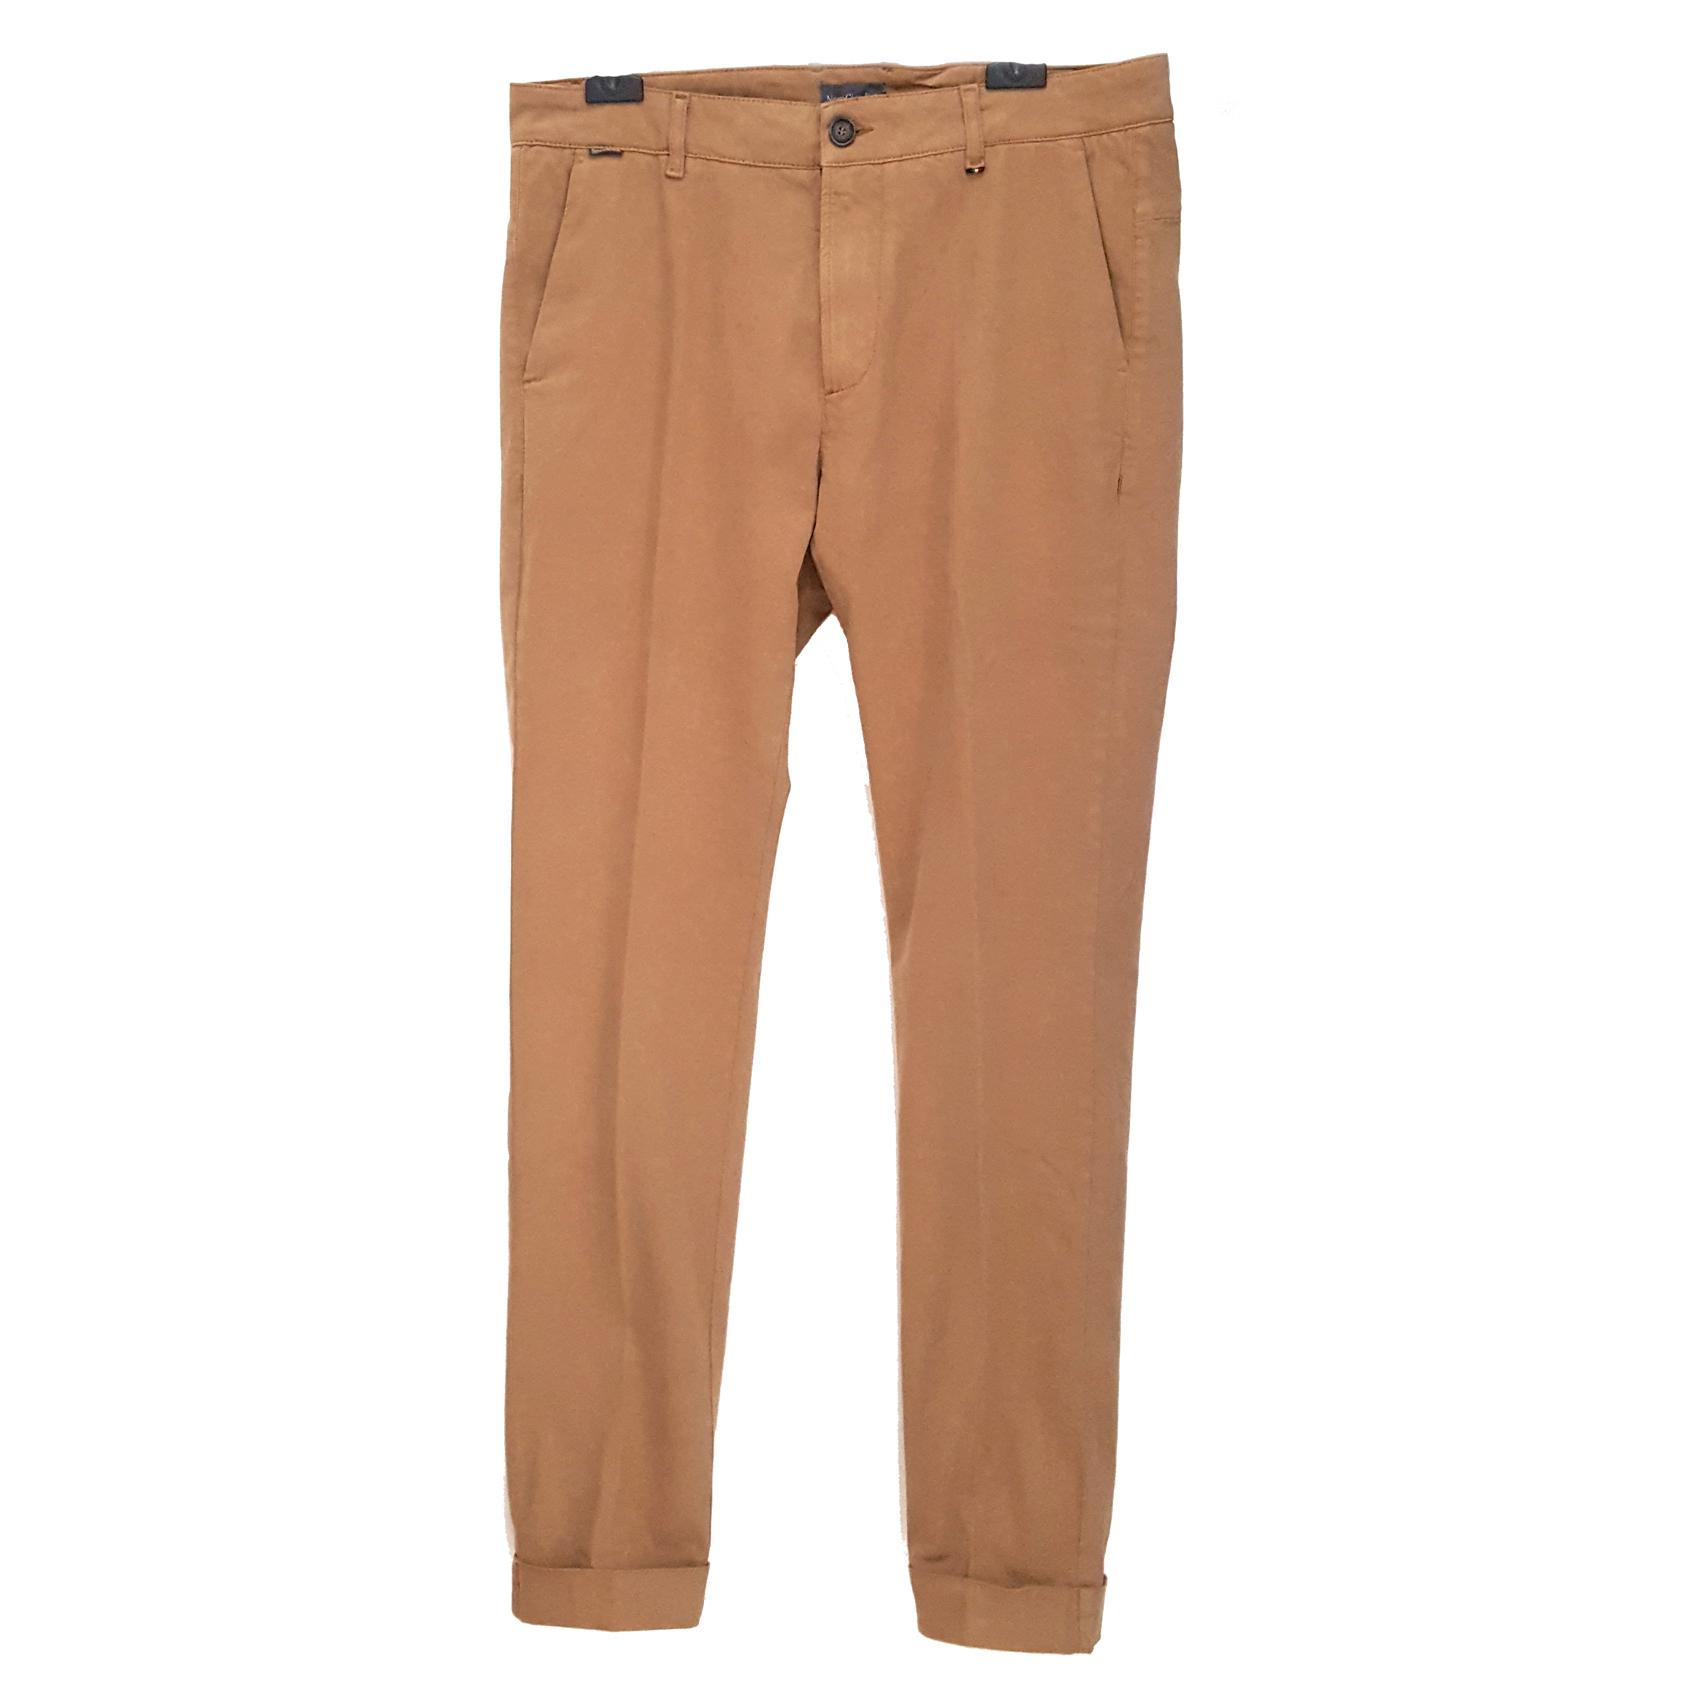 Pantalone chino cammello Nero Giardini